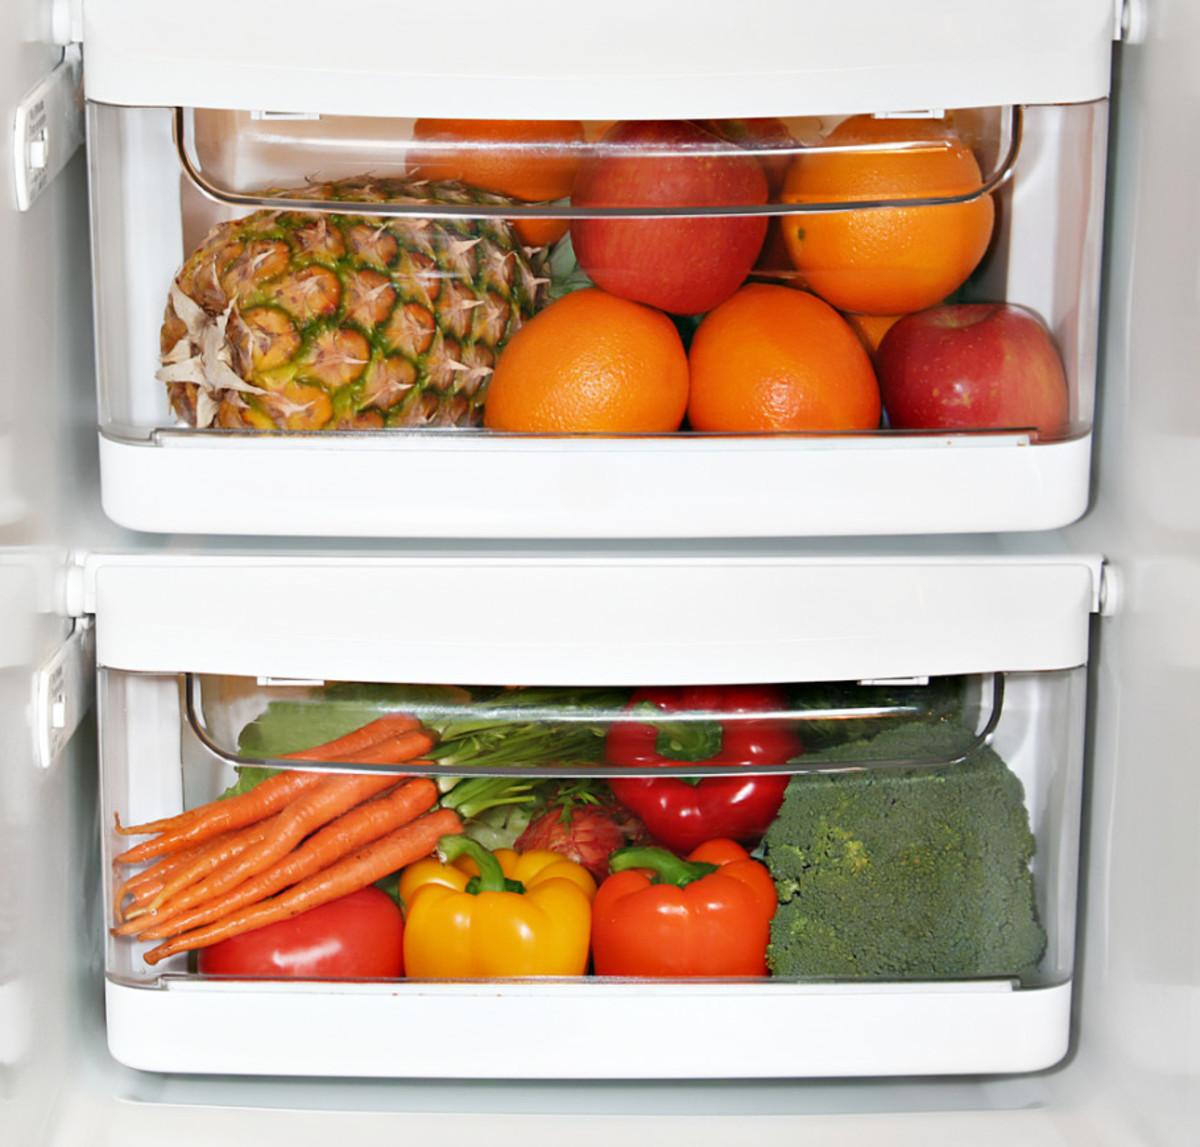 This communal fridge is helping curb food waste.